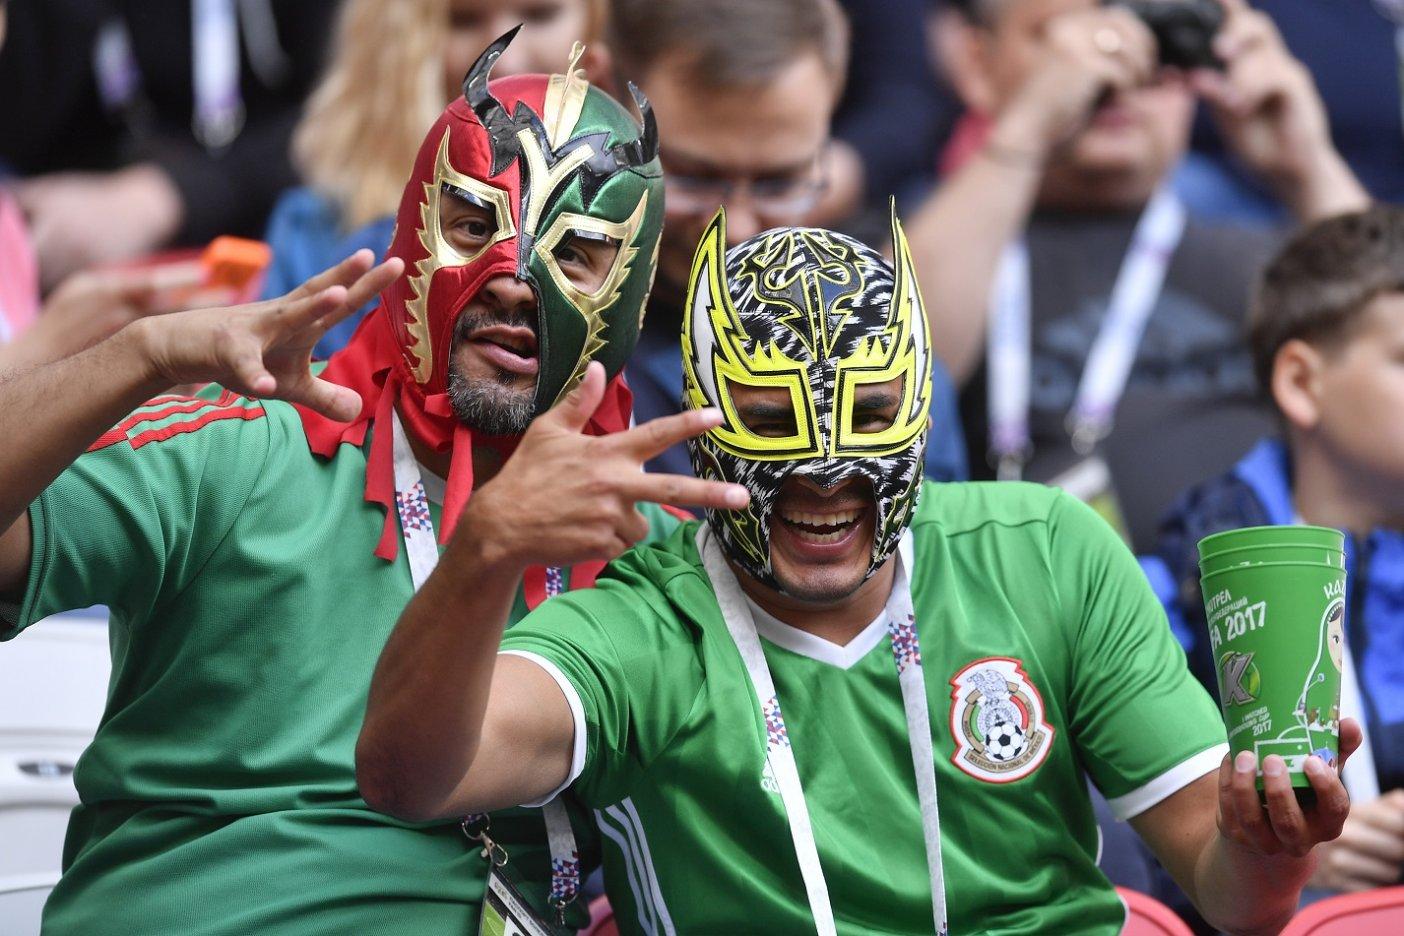 FIFA emitió otra advertencia a México por grito de aficionados ¡Ehhh, p...!